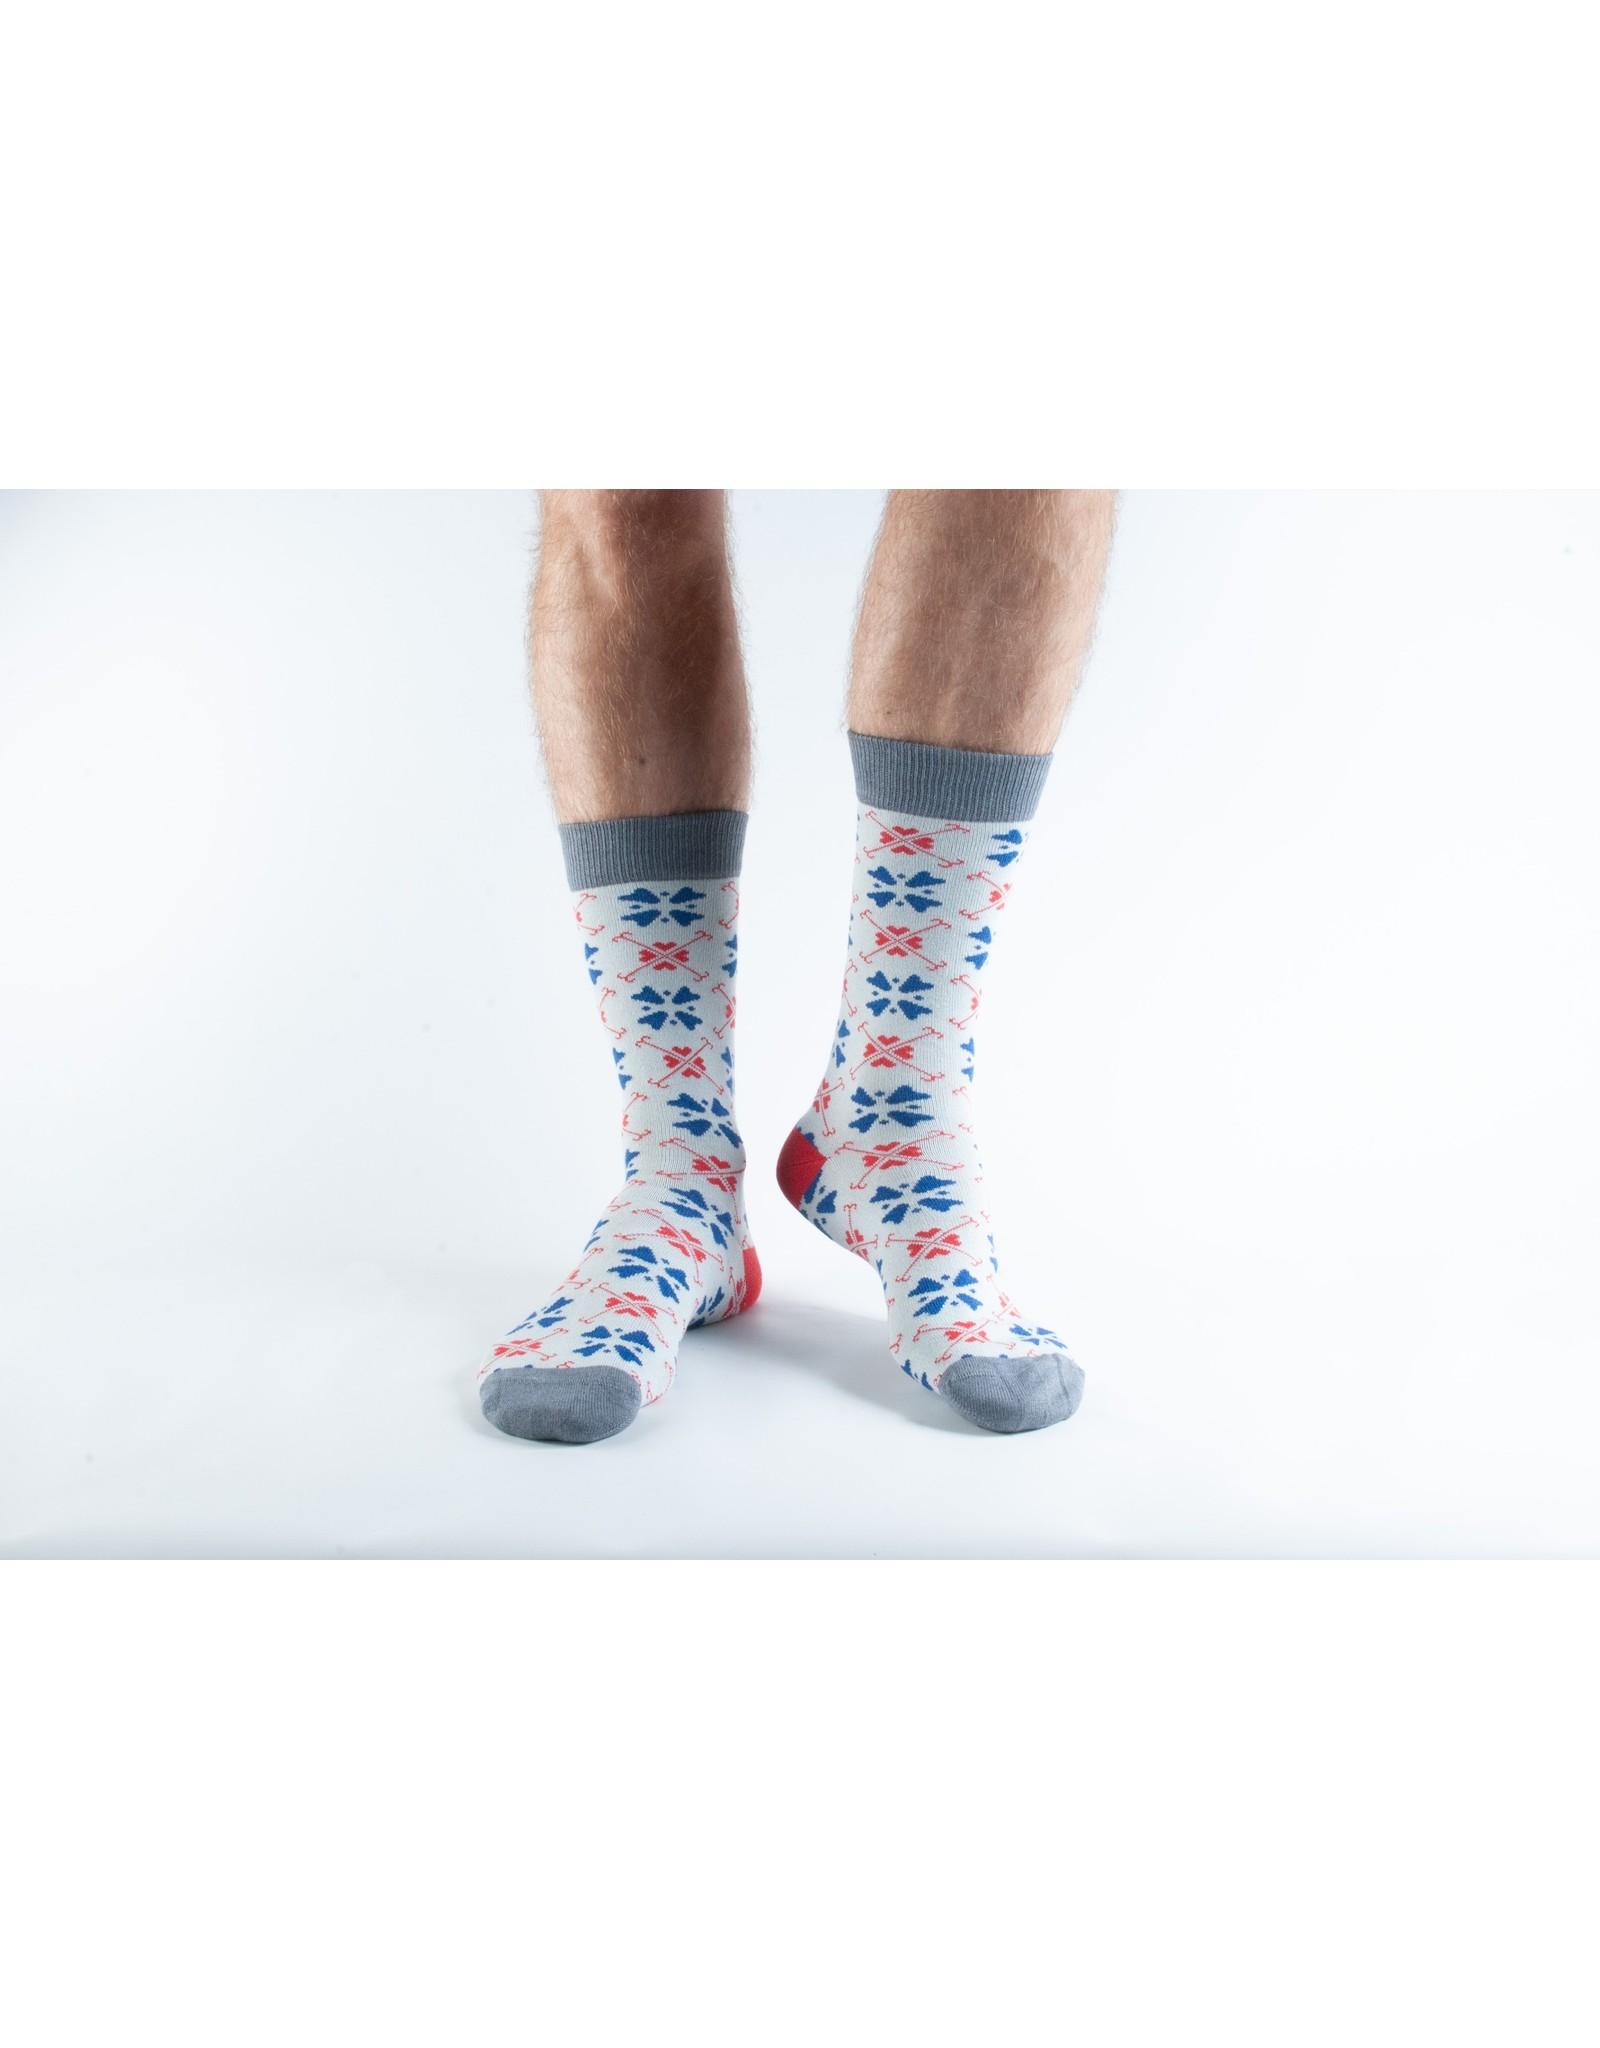 Doris & Dude Christmas socks - snowflake (36-40)